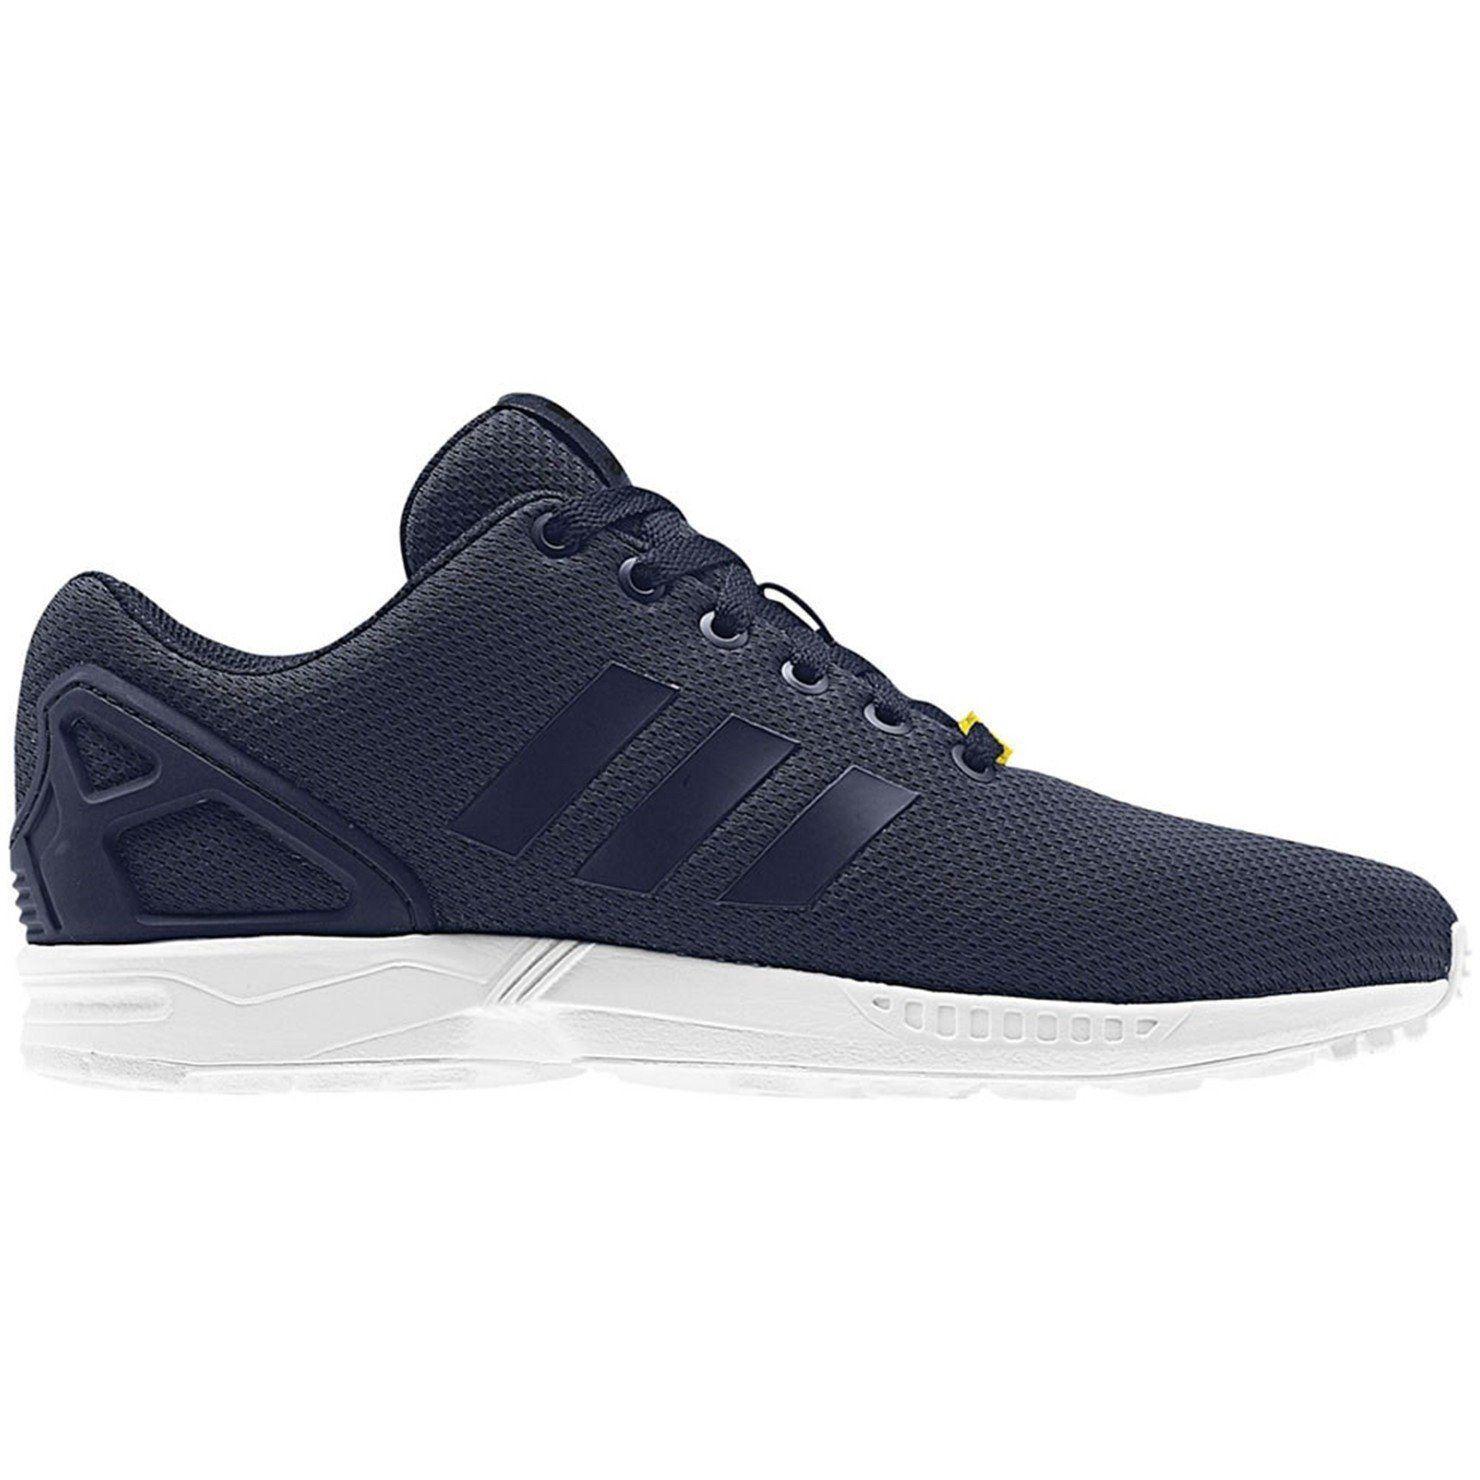 innovative design 2dc96 48239 Adidas ORIGINALS ZX FLUX formateurs marine espadrilles chaussures 3 STRIPES taille  UK 8 hommes